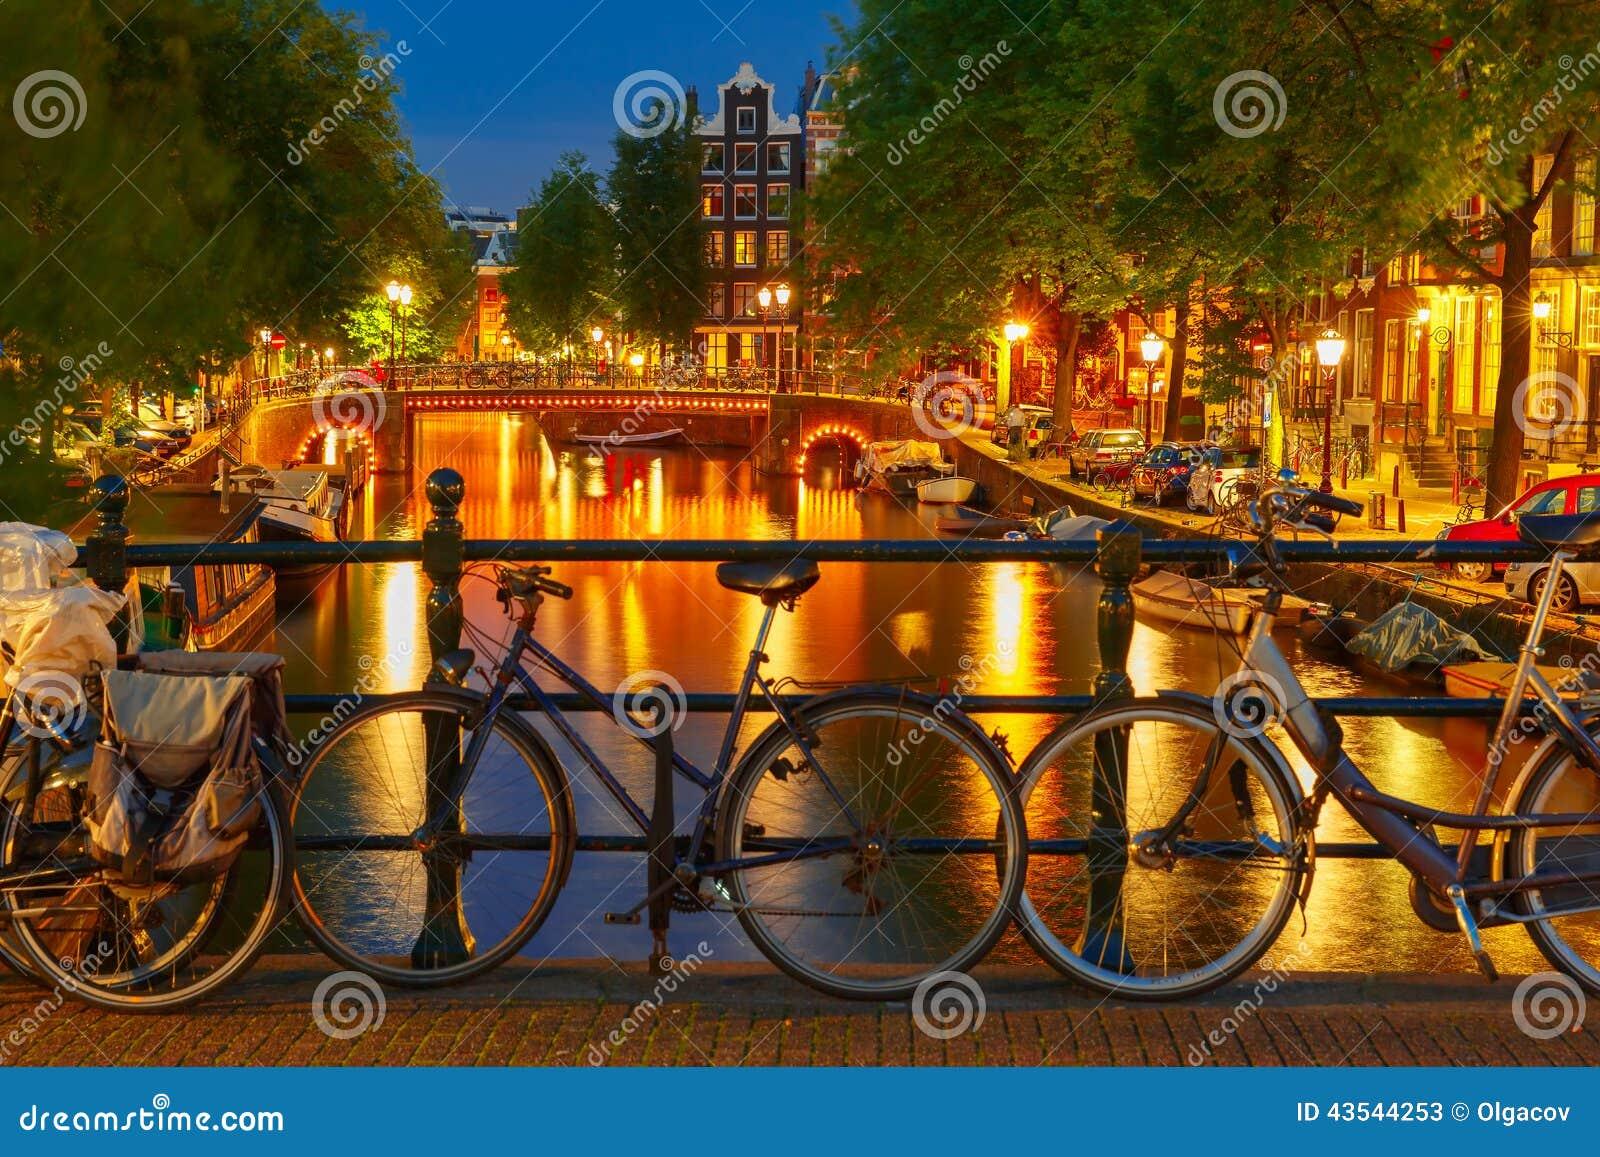 Night illumination of Amsterdam canal and bridge